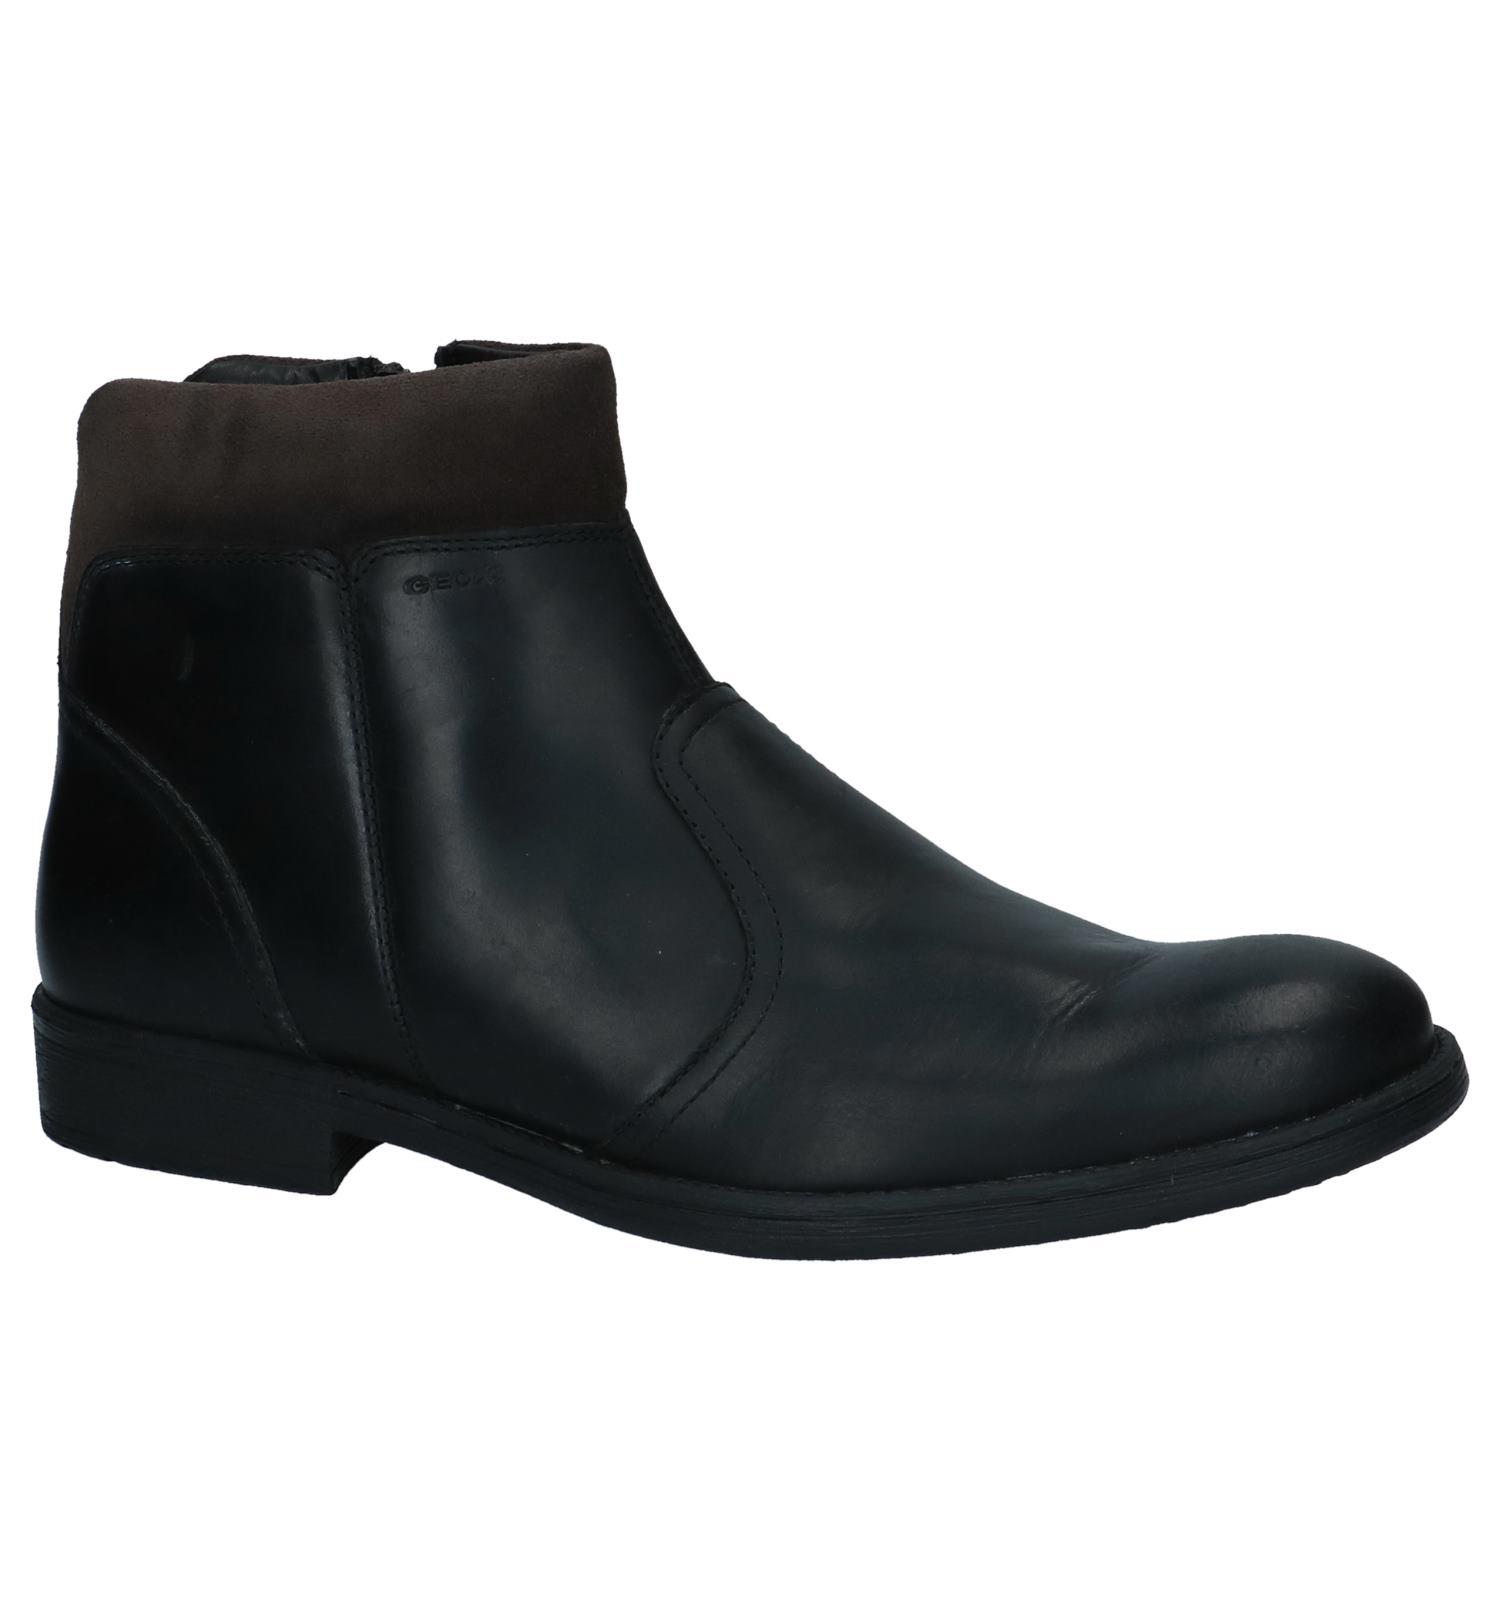 9b9cba1c571 Zwarte Geklede Boots Geox   TORFS.BE   Gratis verzend en retour